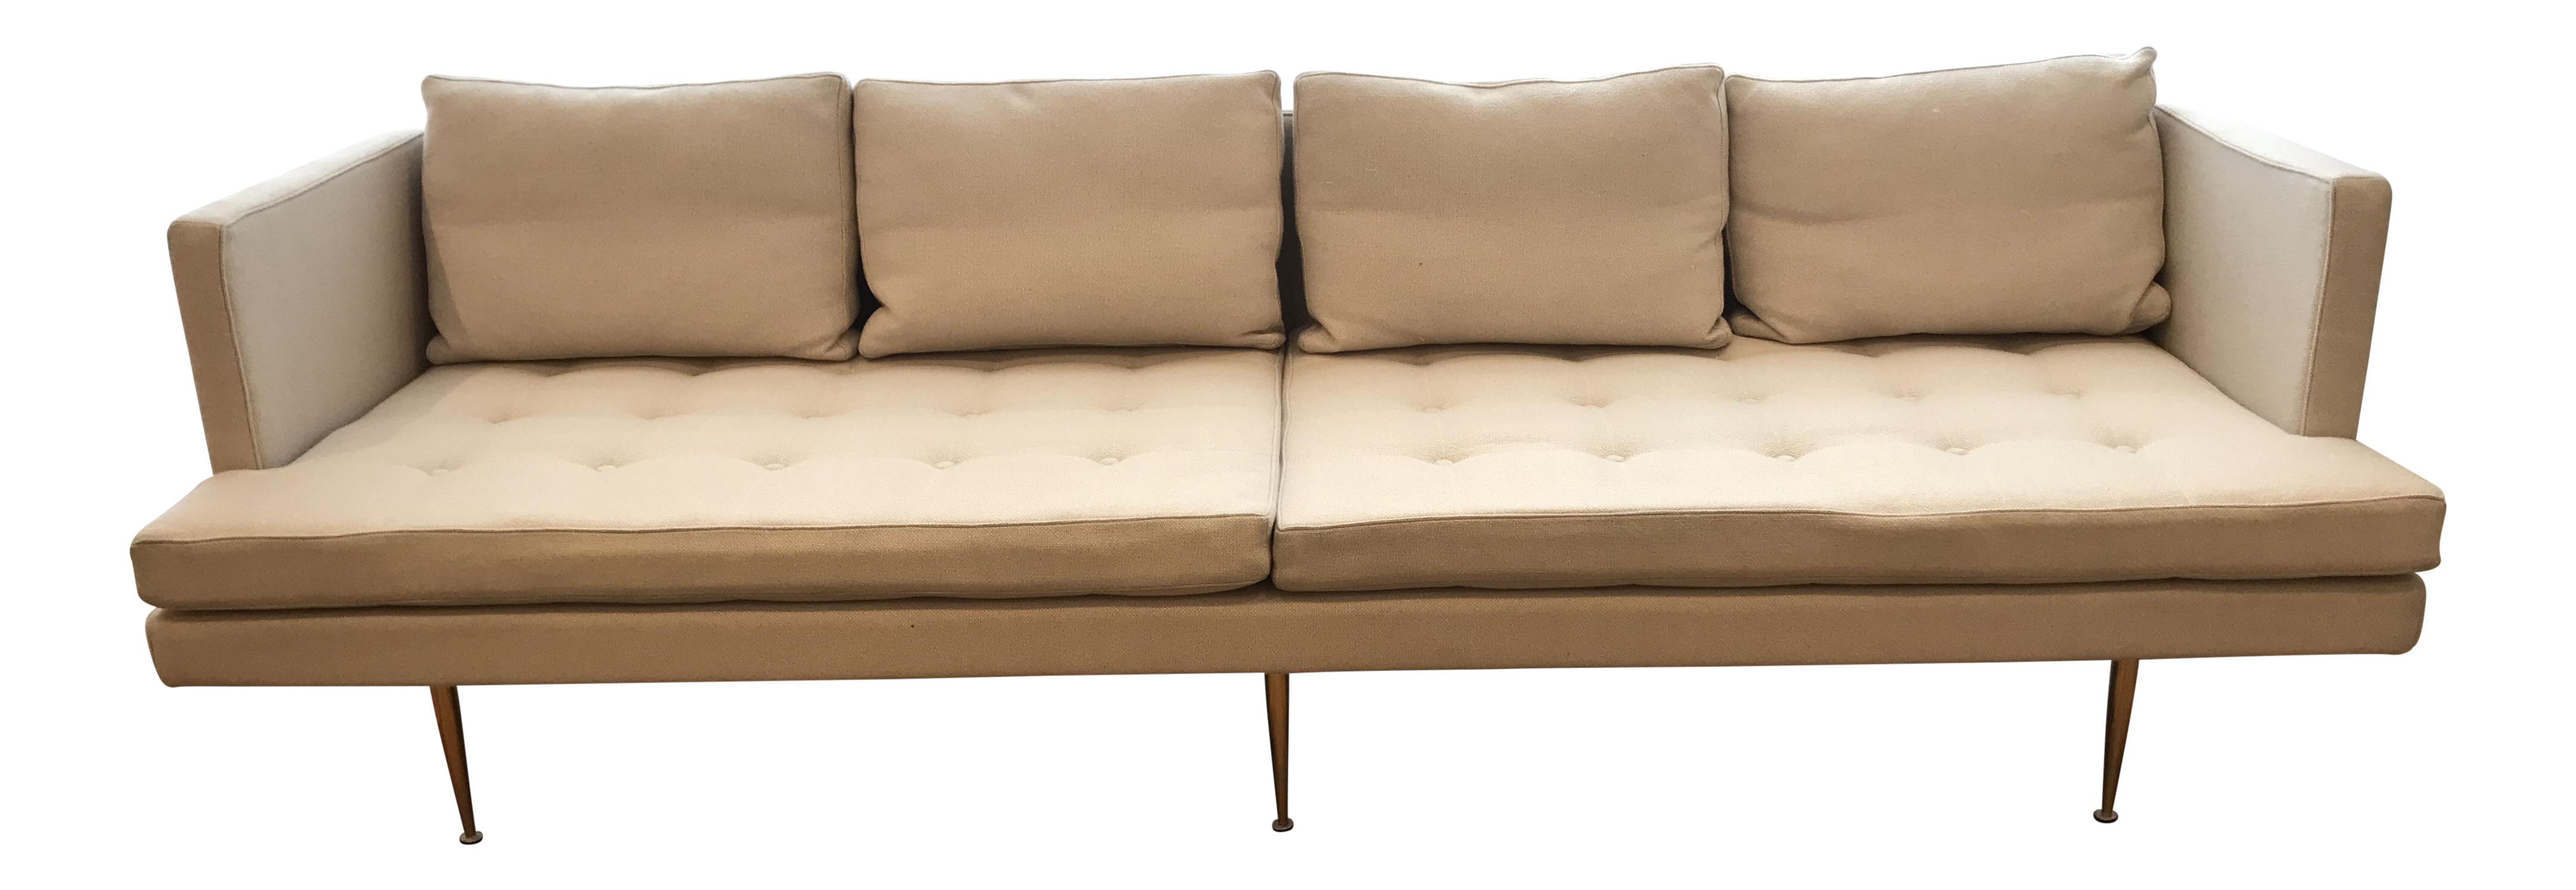 Amazing Organic Modernism Siena Sofa   Image 1 Of 8